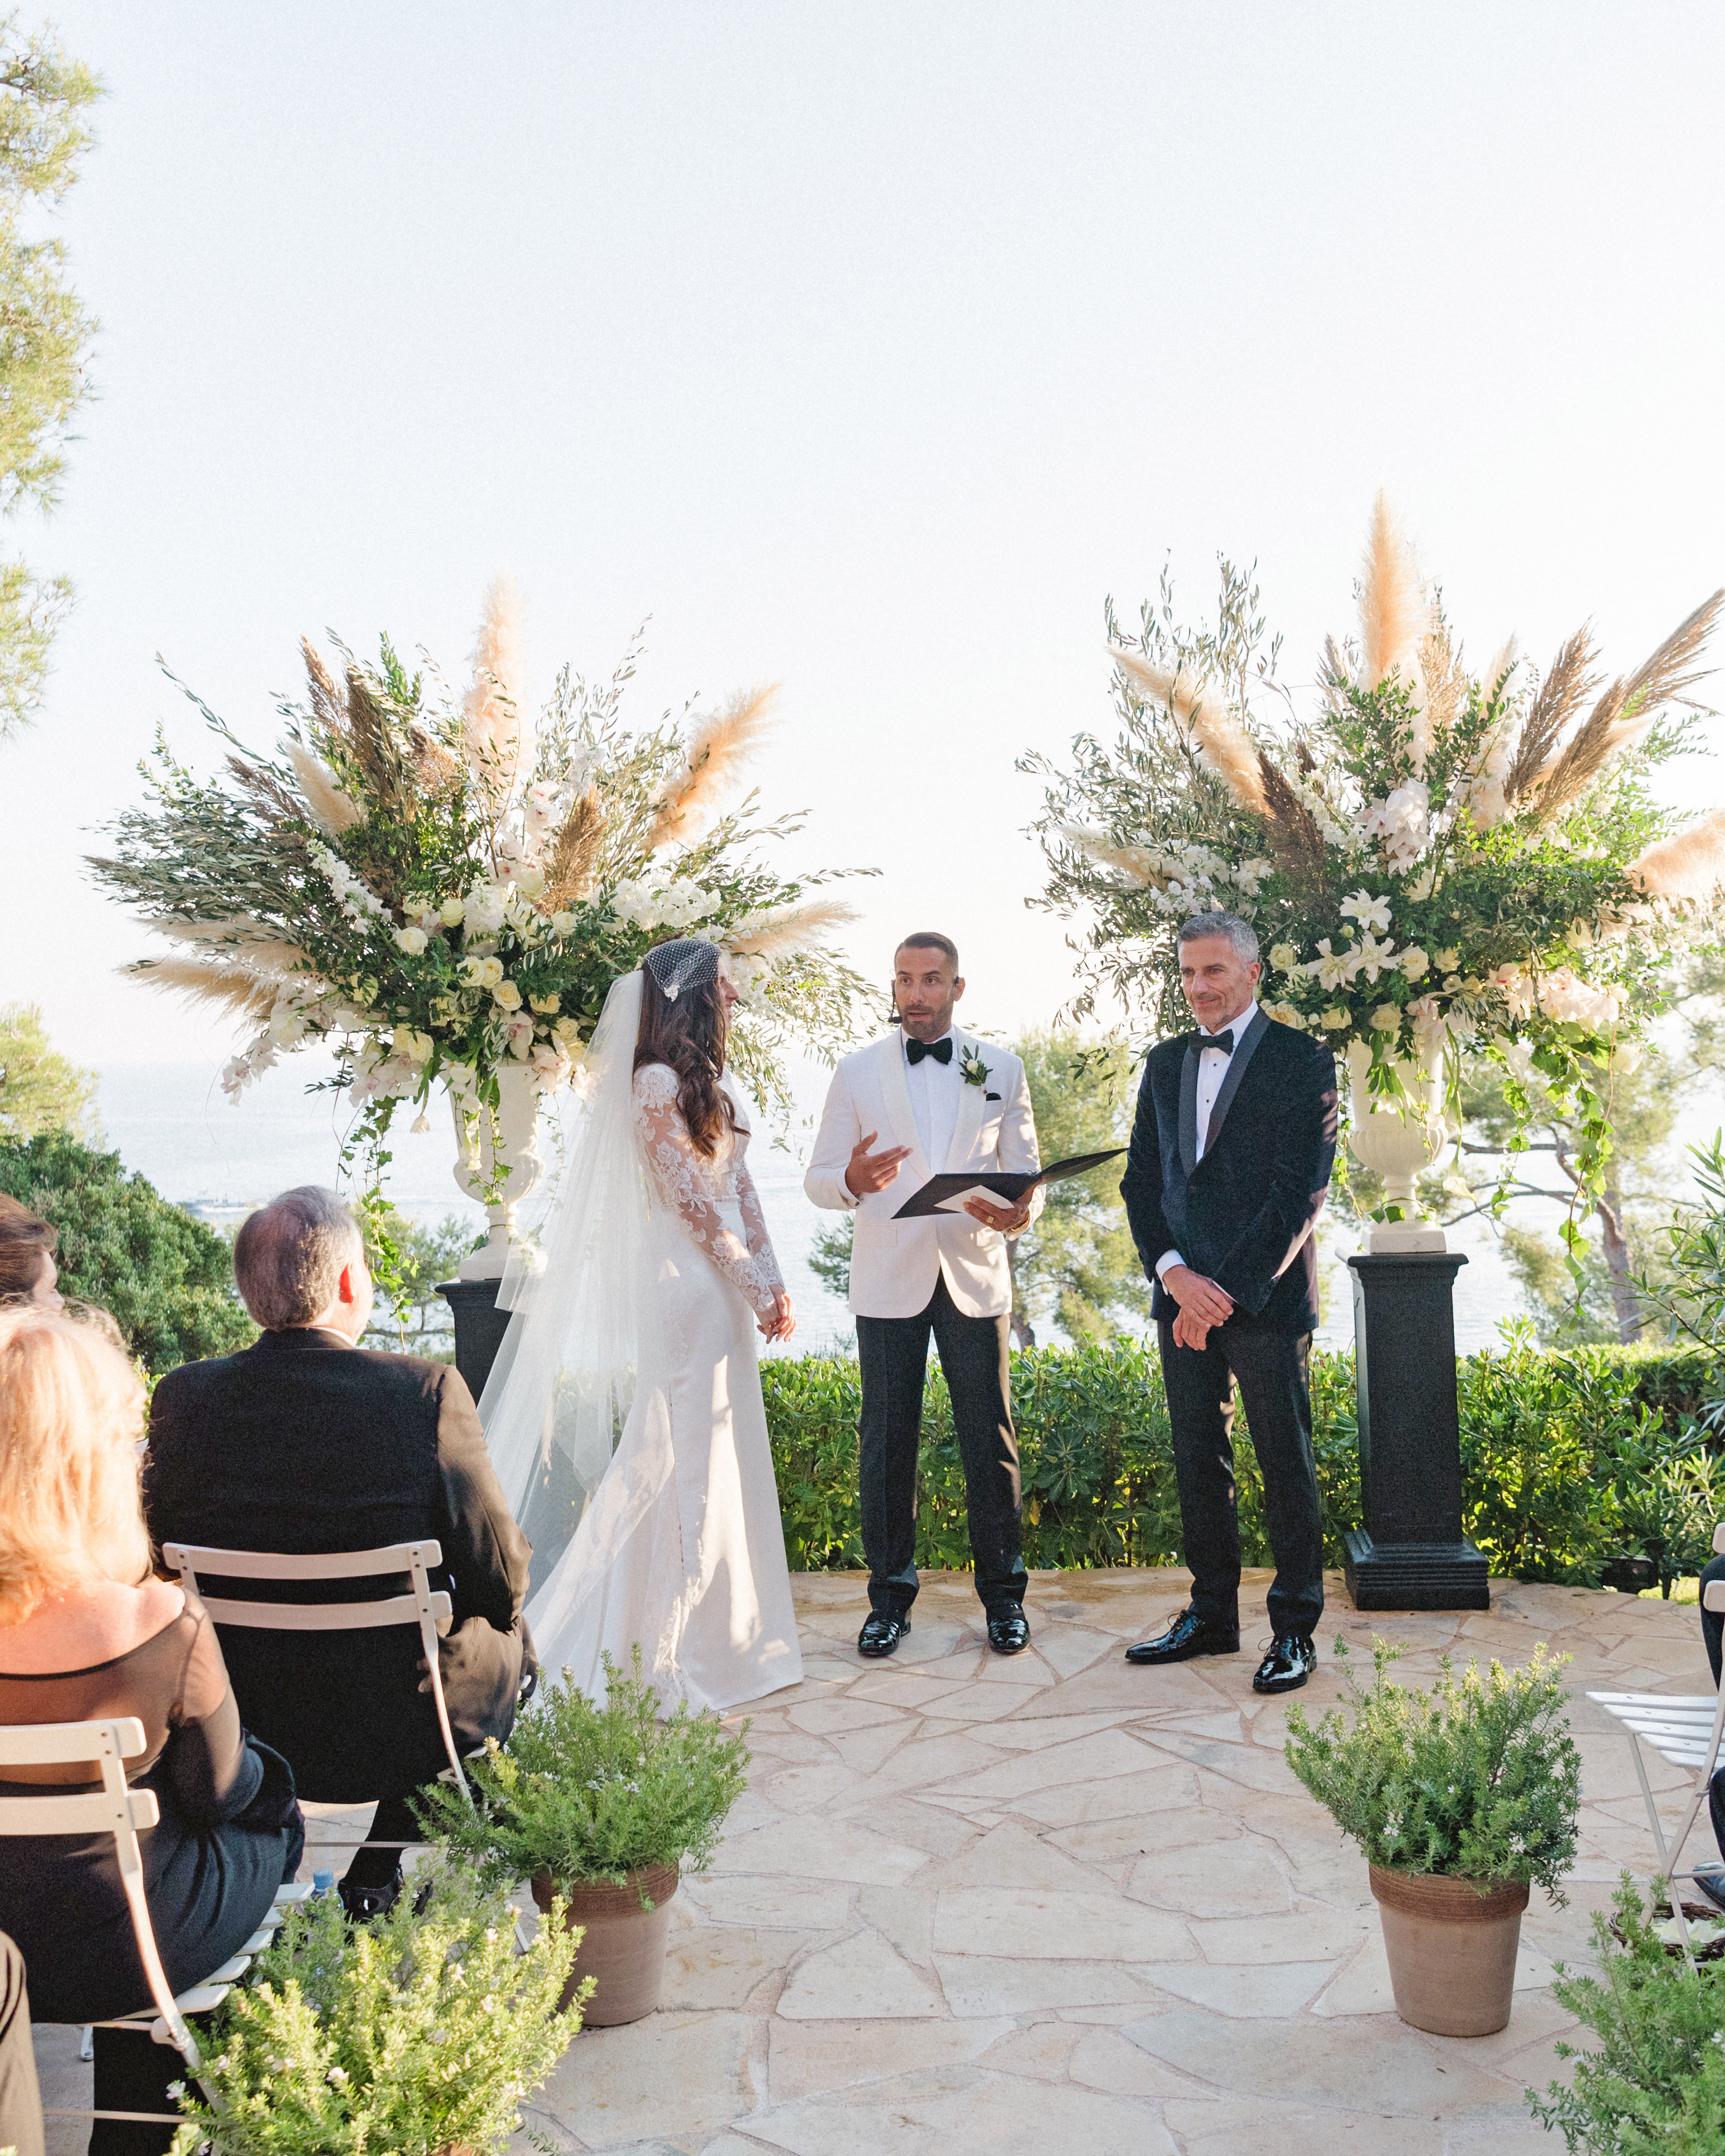 jiannina enzo wedding ceremony